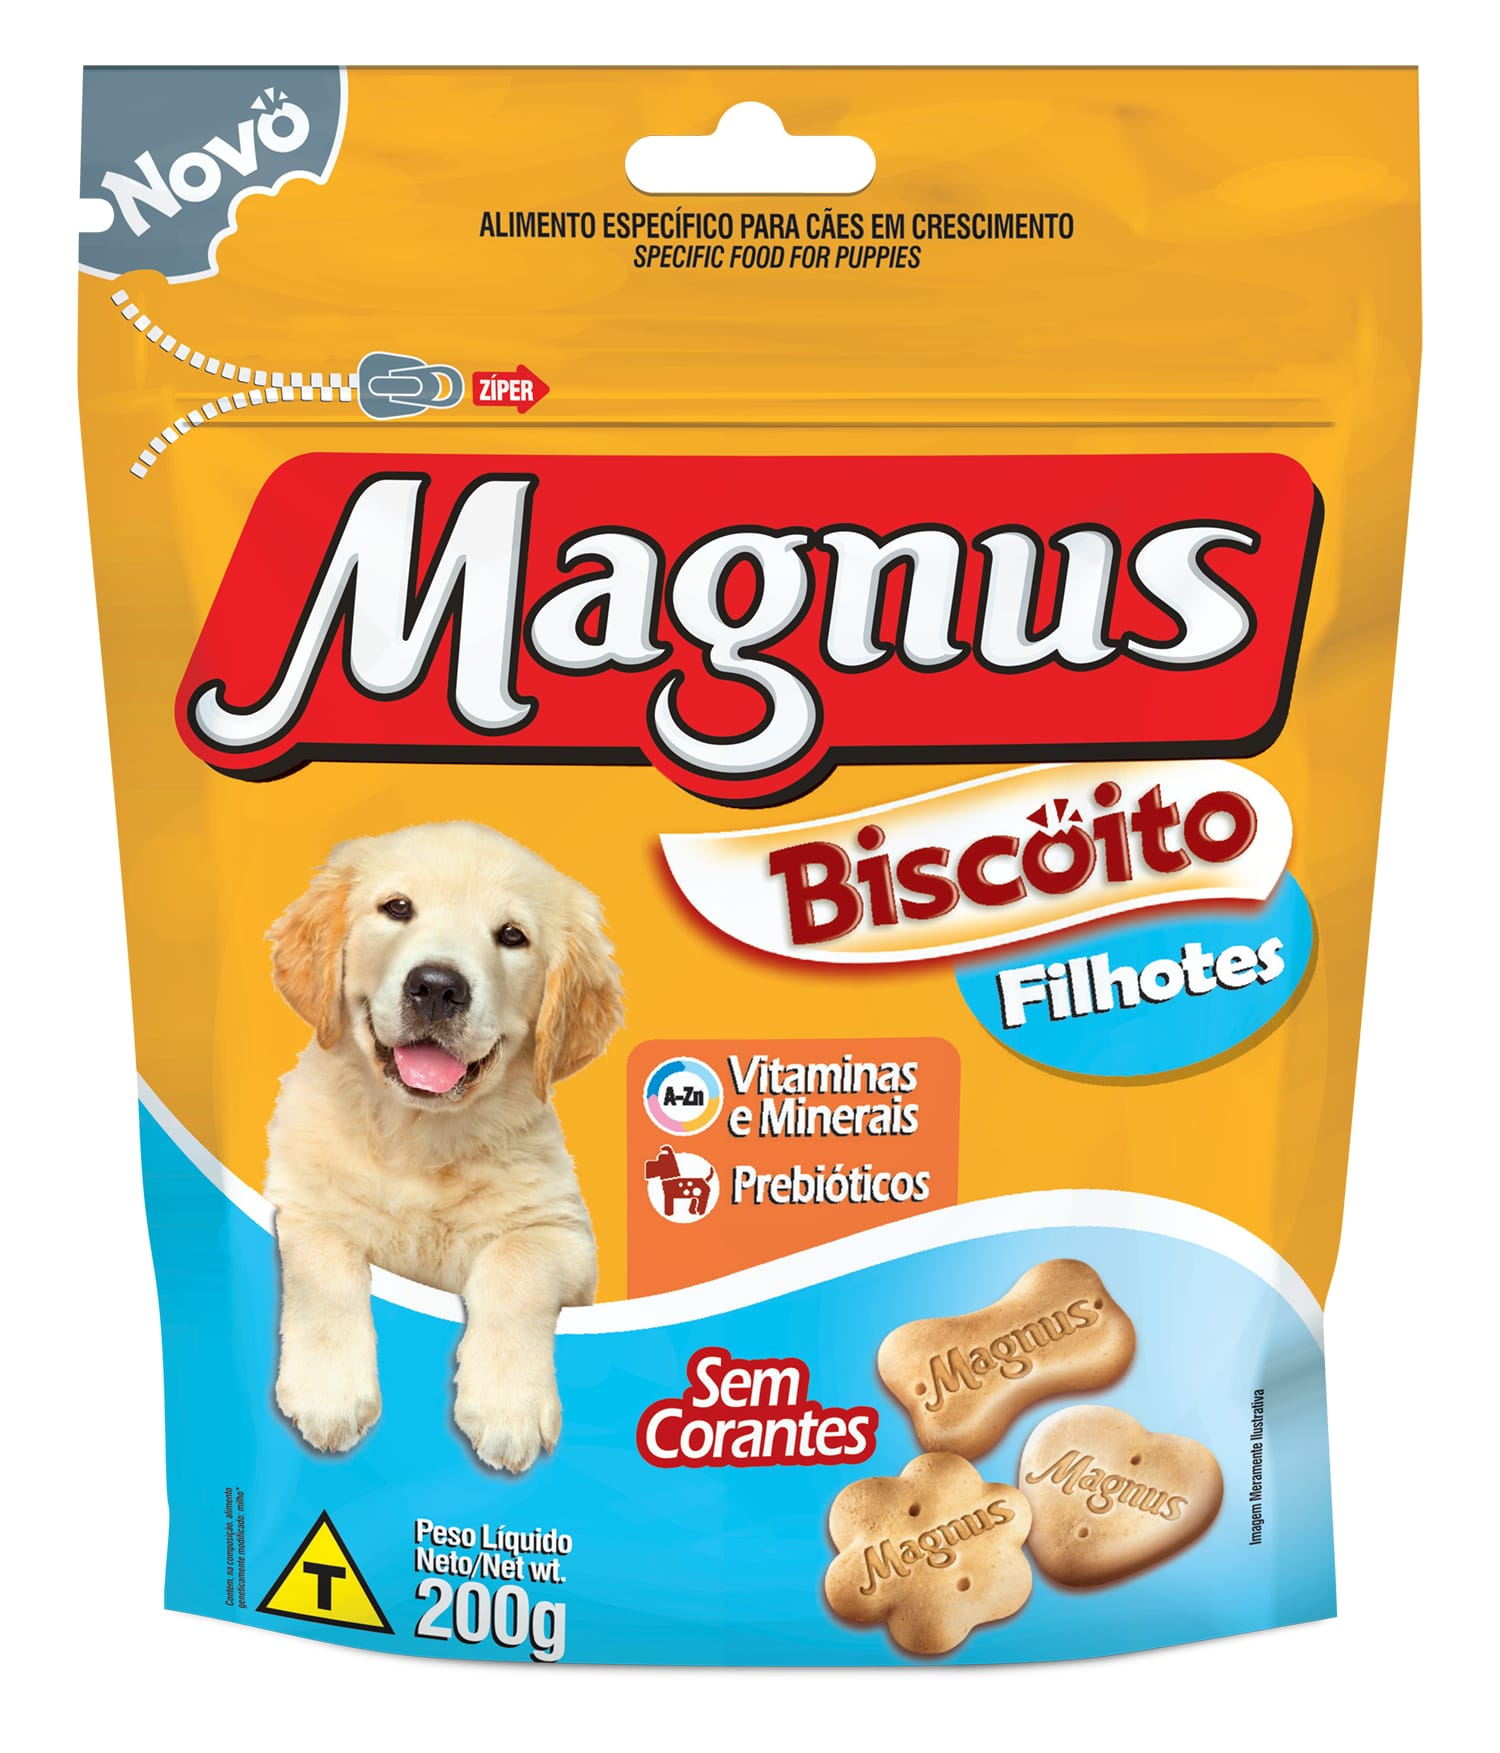 BISCOITO MAGNUS FILHOTES 200GR